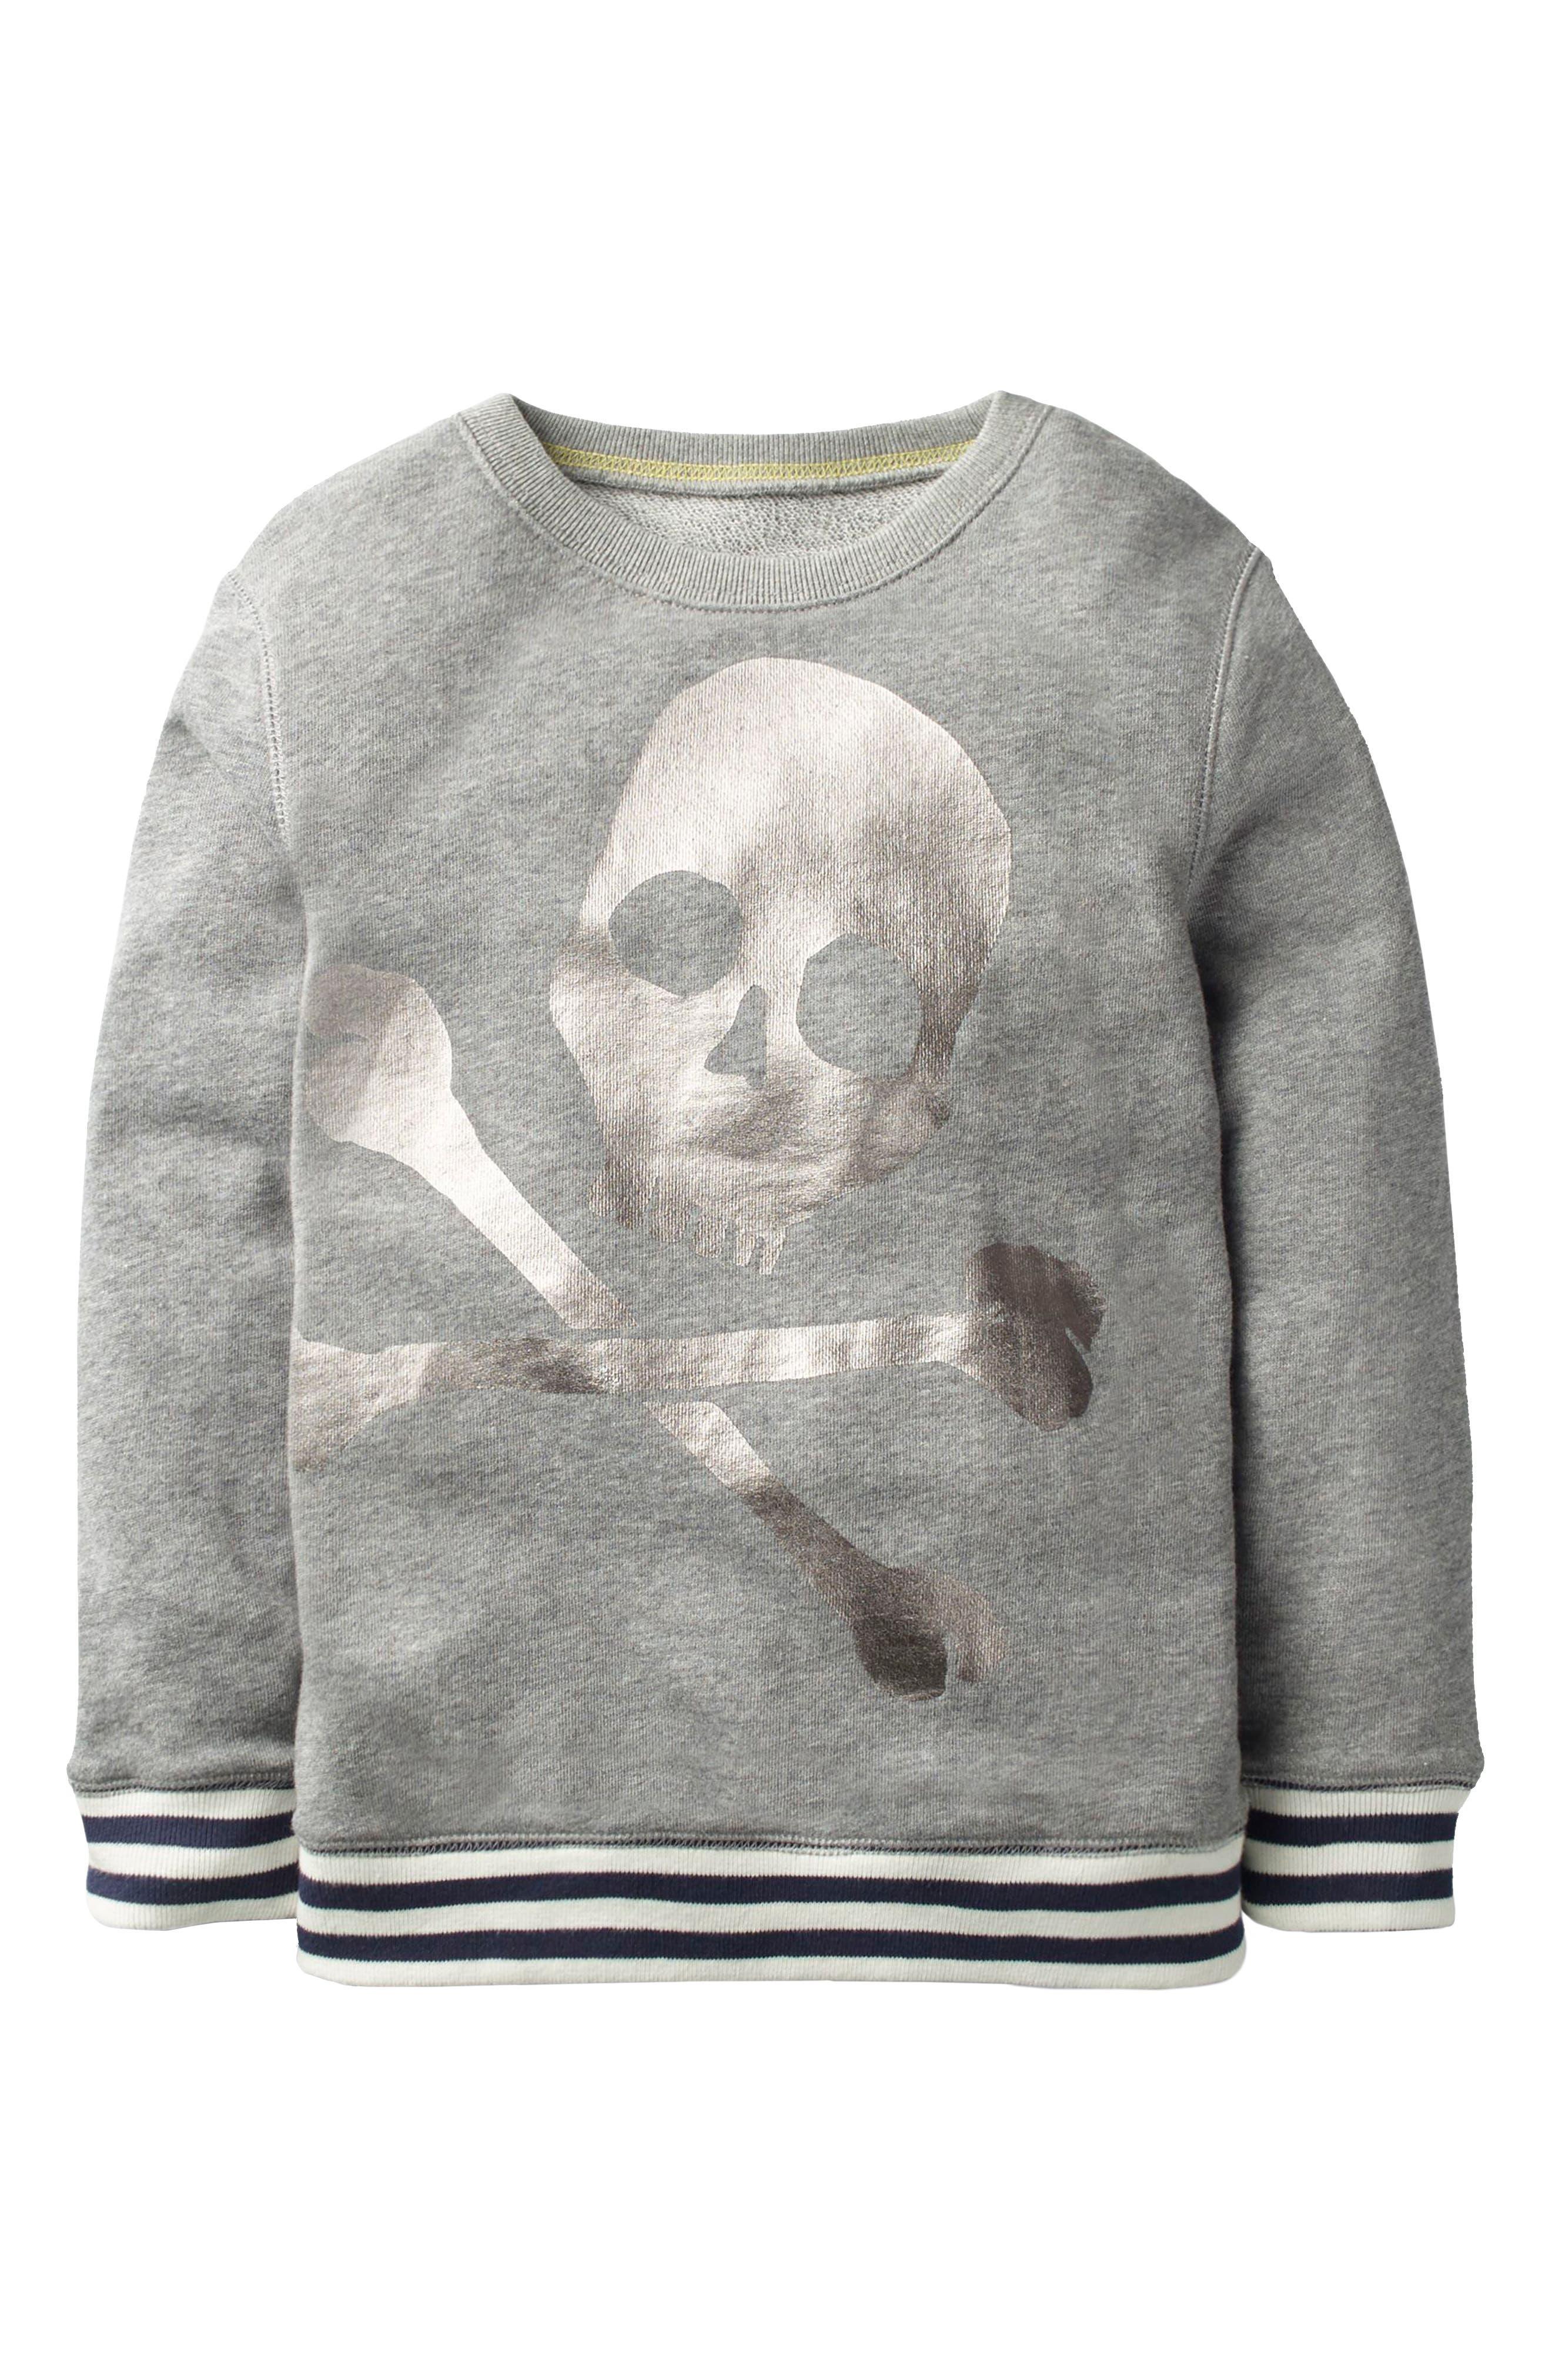 Fun Skull Sweatshirt,                             Main thumbnail 1, color,                             034